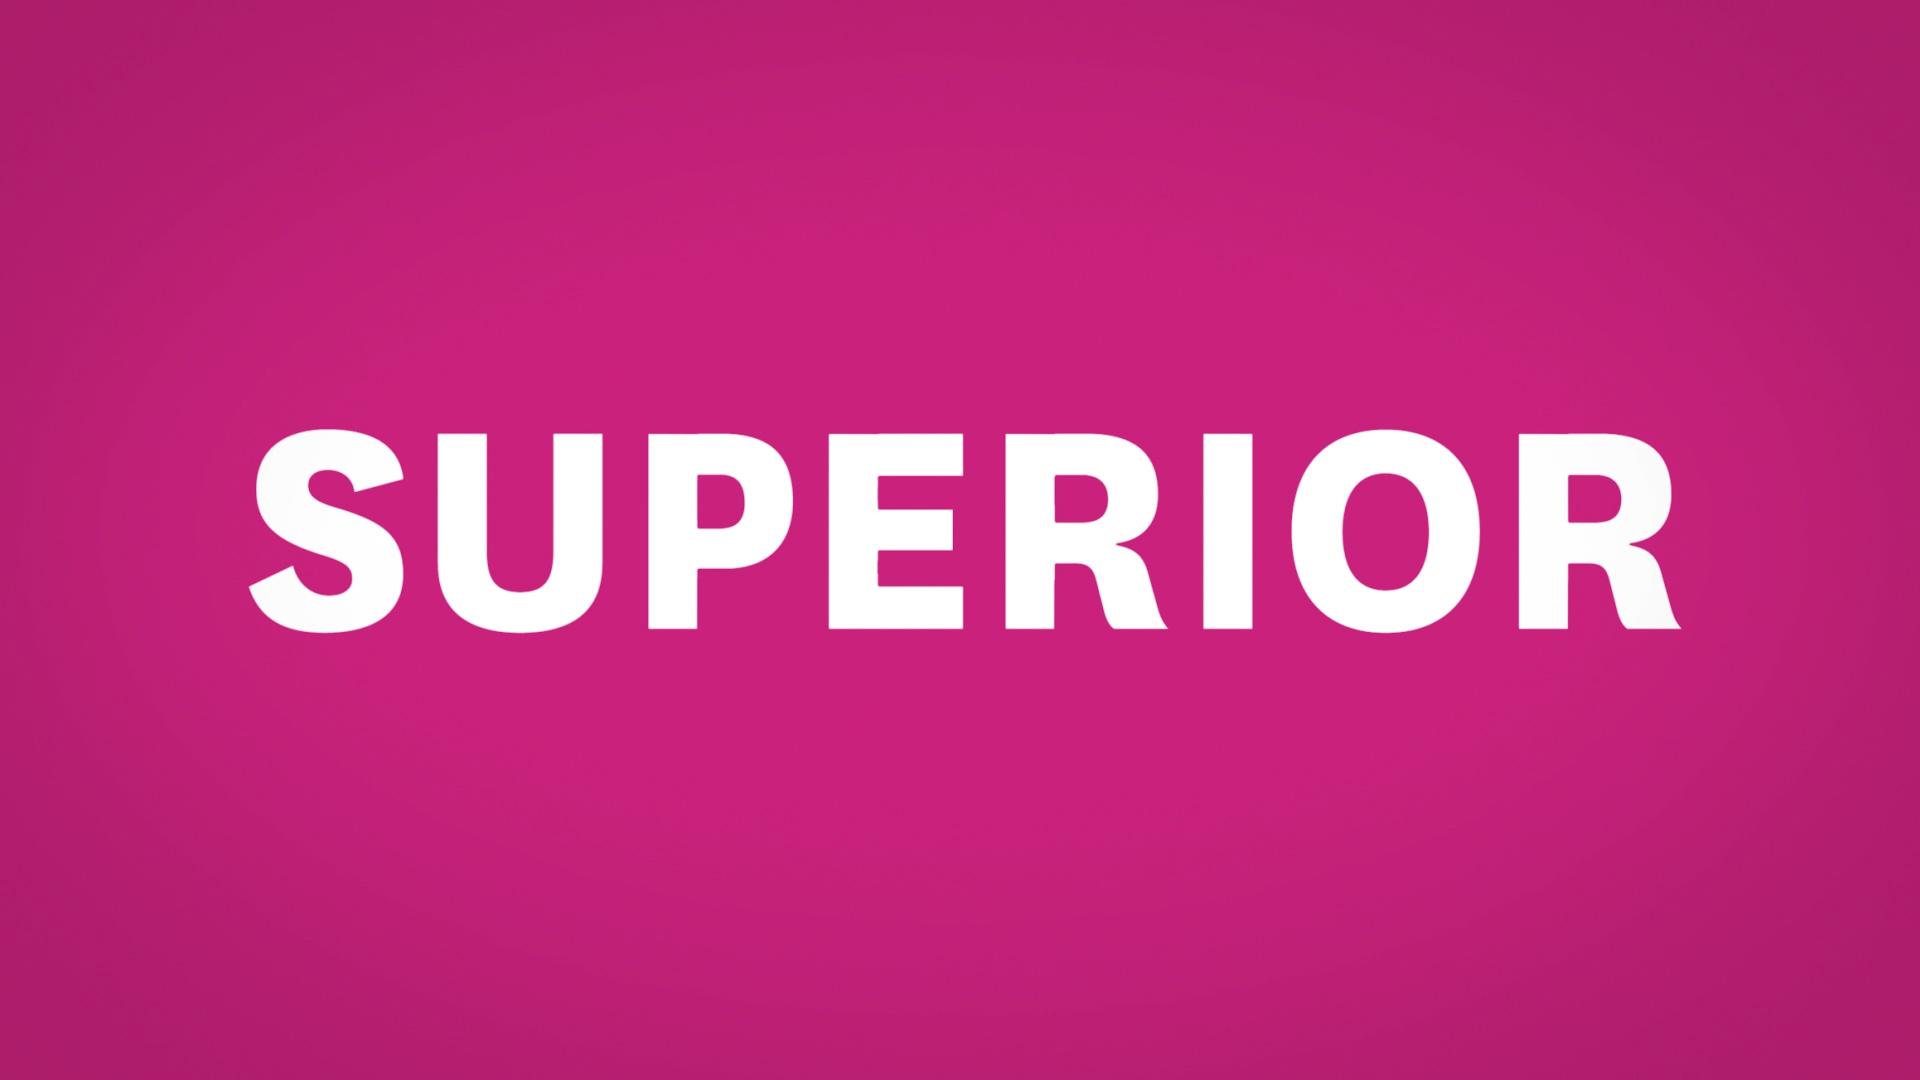 SuperiorHealth-01-07.jpg